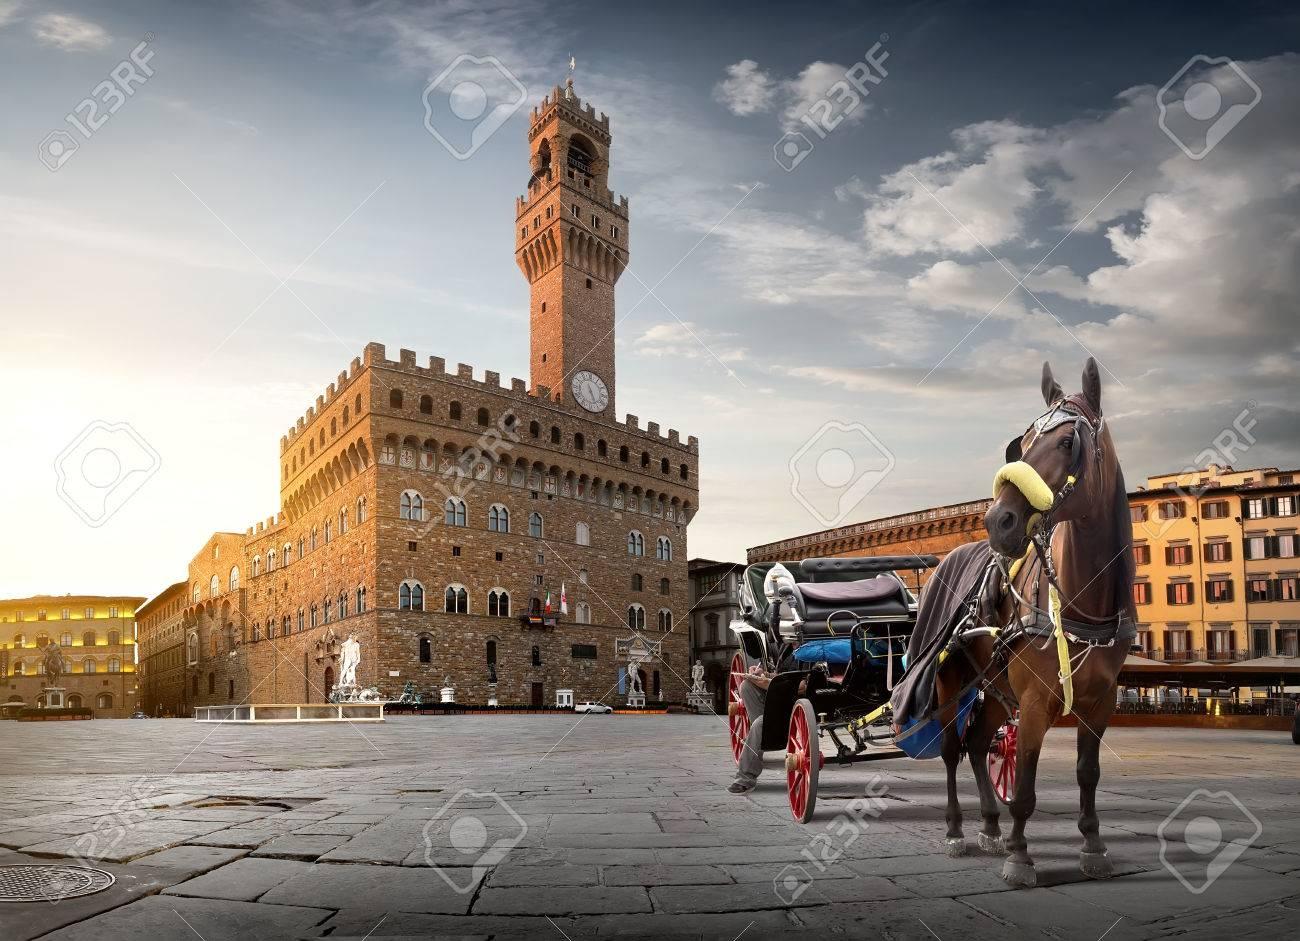 Horse on Piazza della Signoria in Florence at dawn, Italy - 69761632